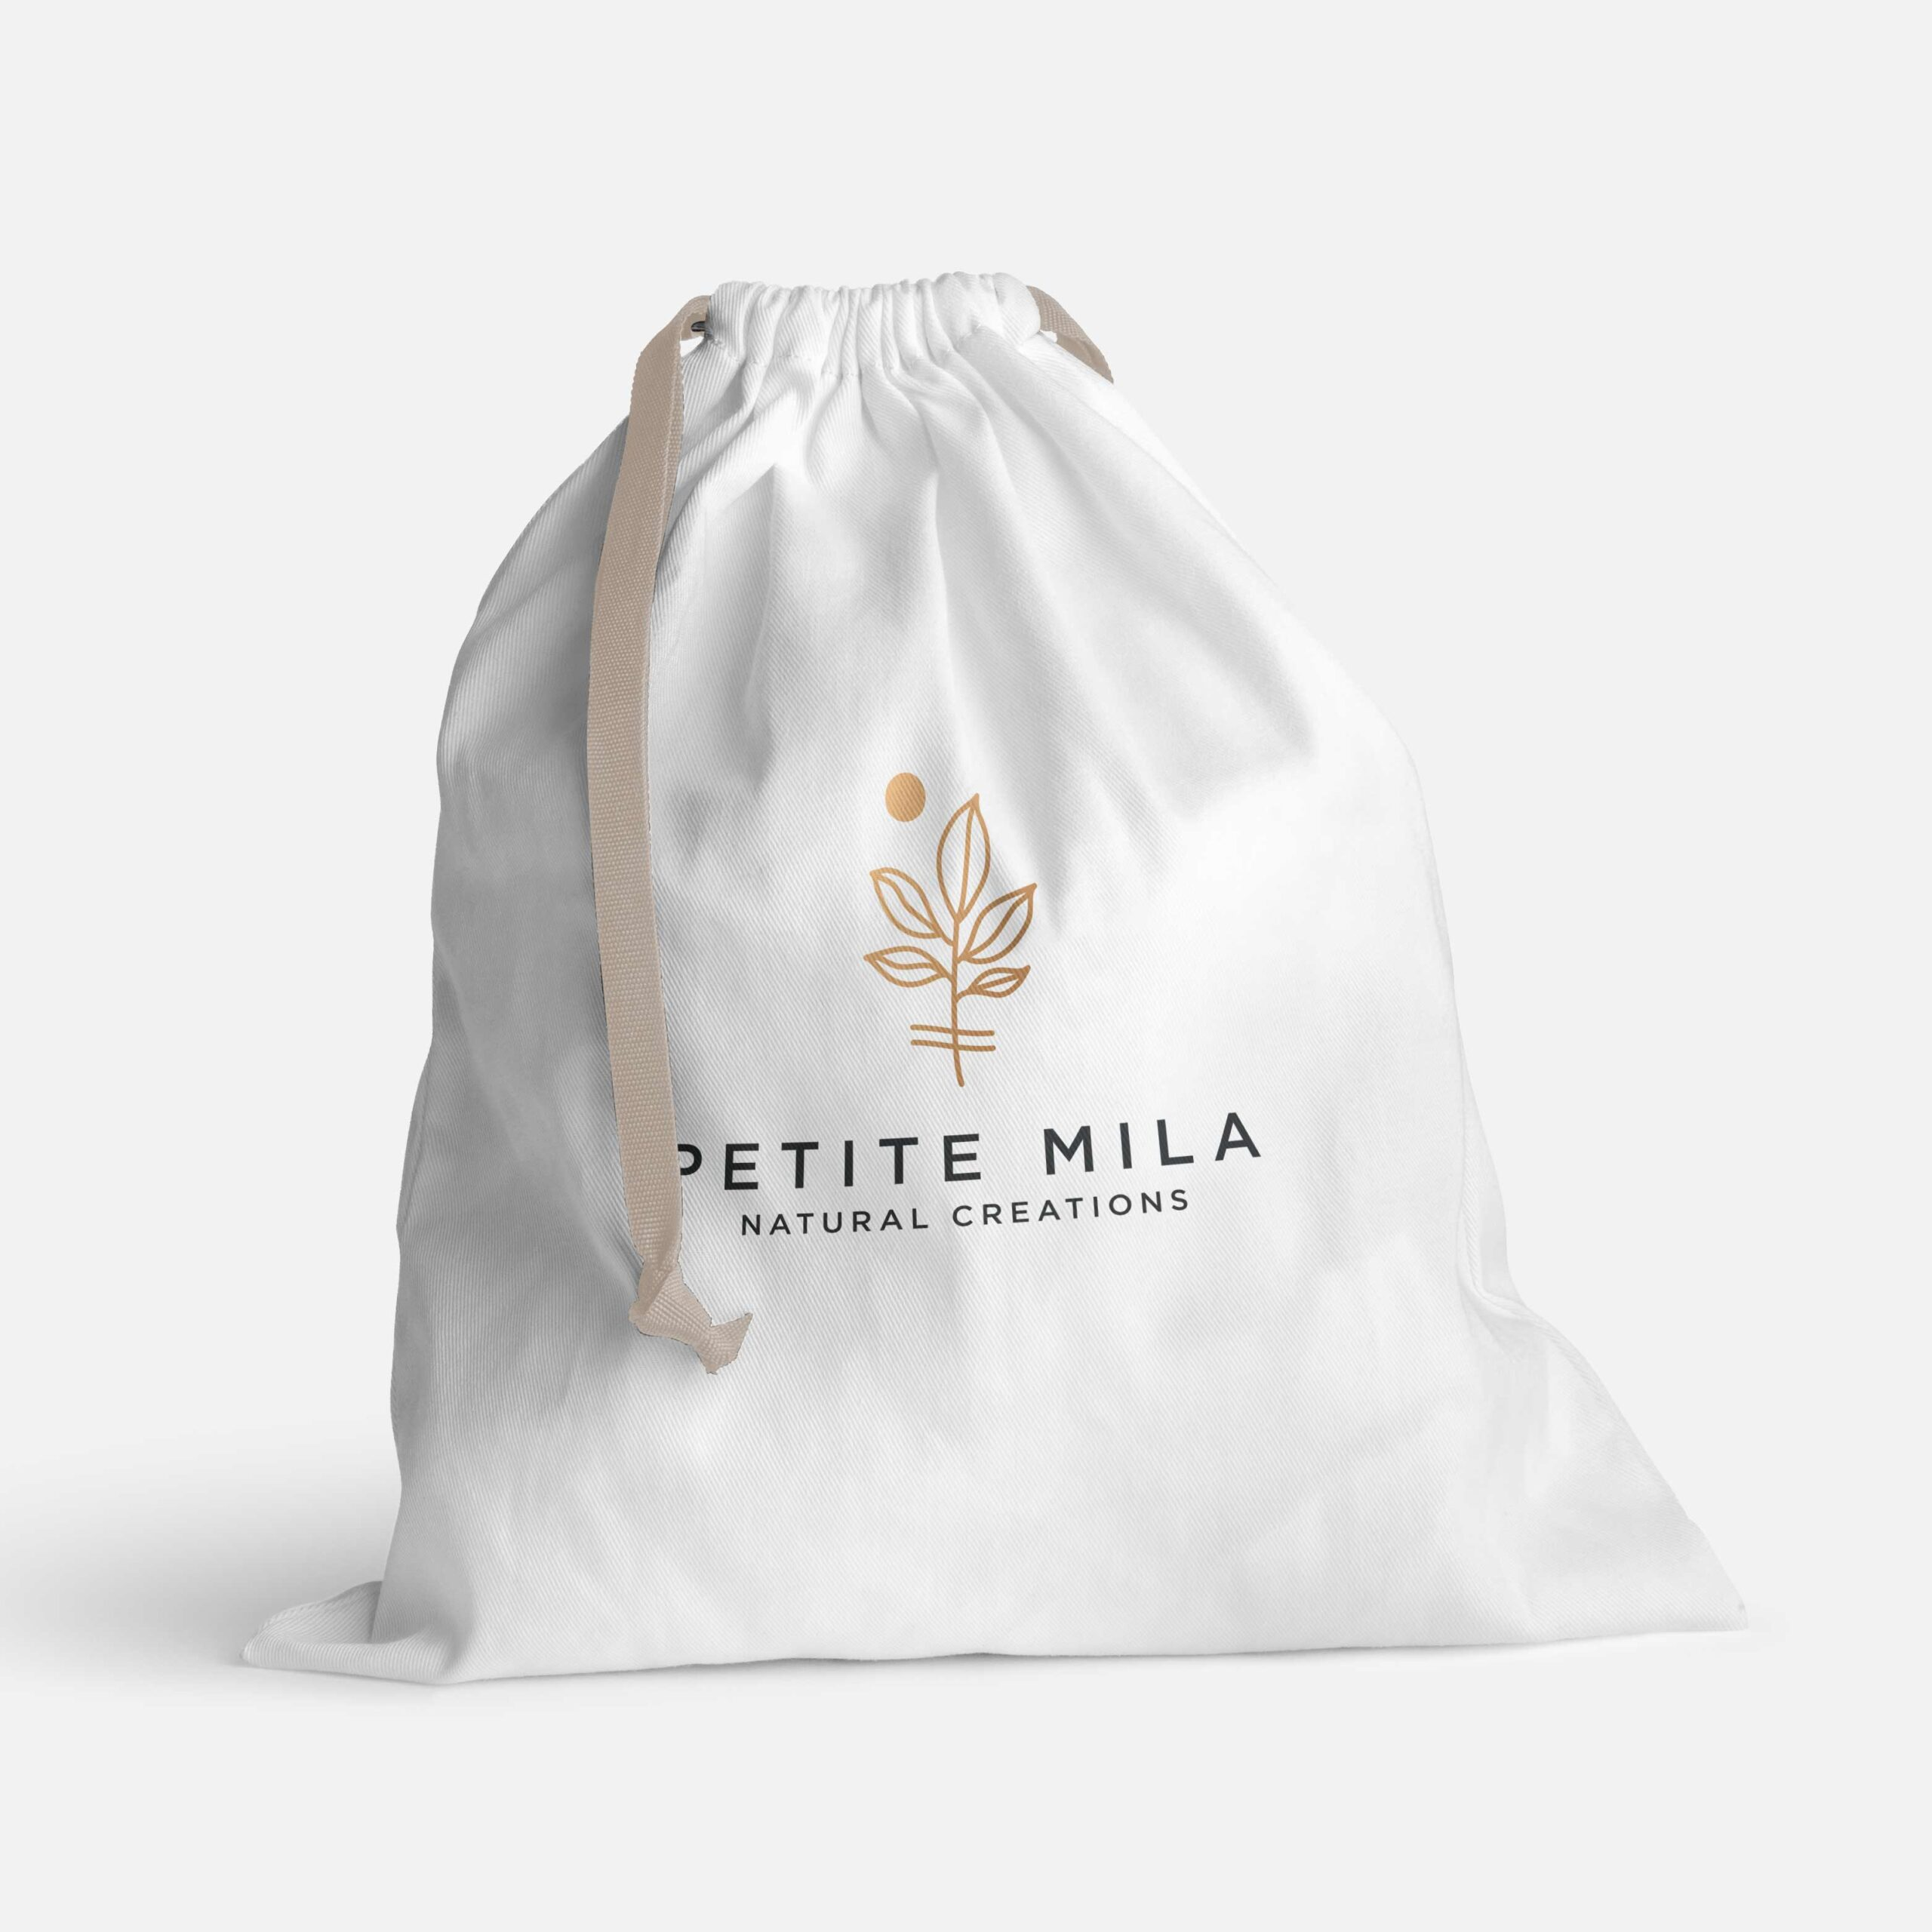 Petite-Mila-IG-3